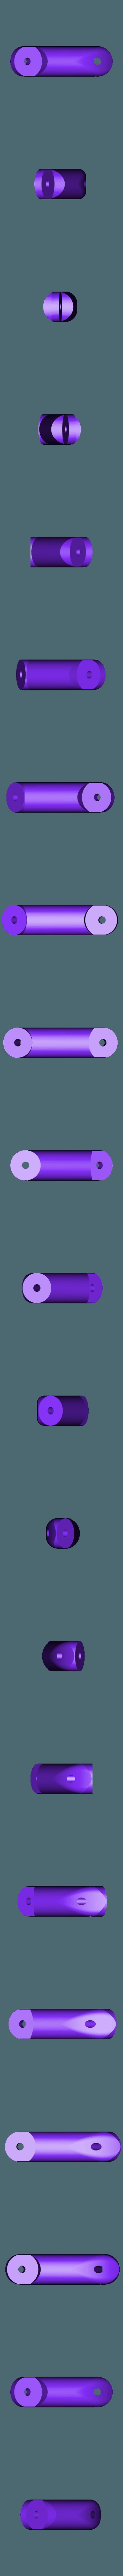 Arm_Top.STL Download free STL file Automata-4 Ben rides around the clock • 3D printer template, woodenclocks